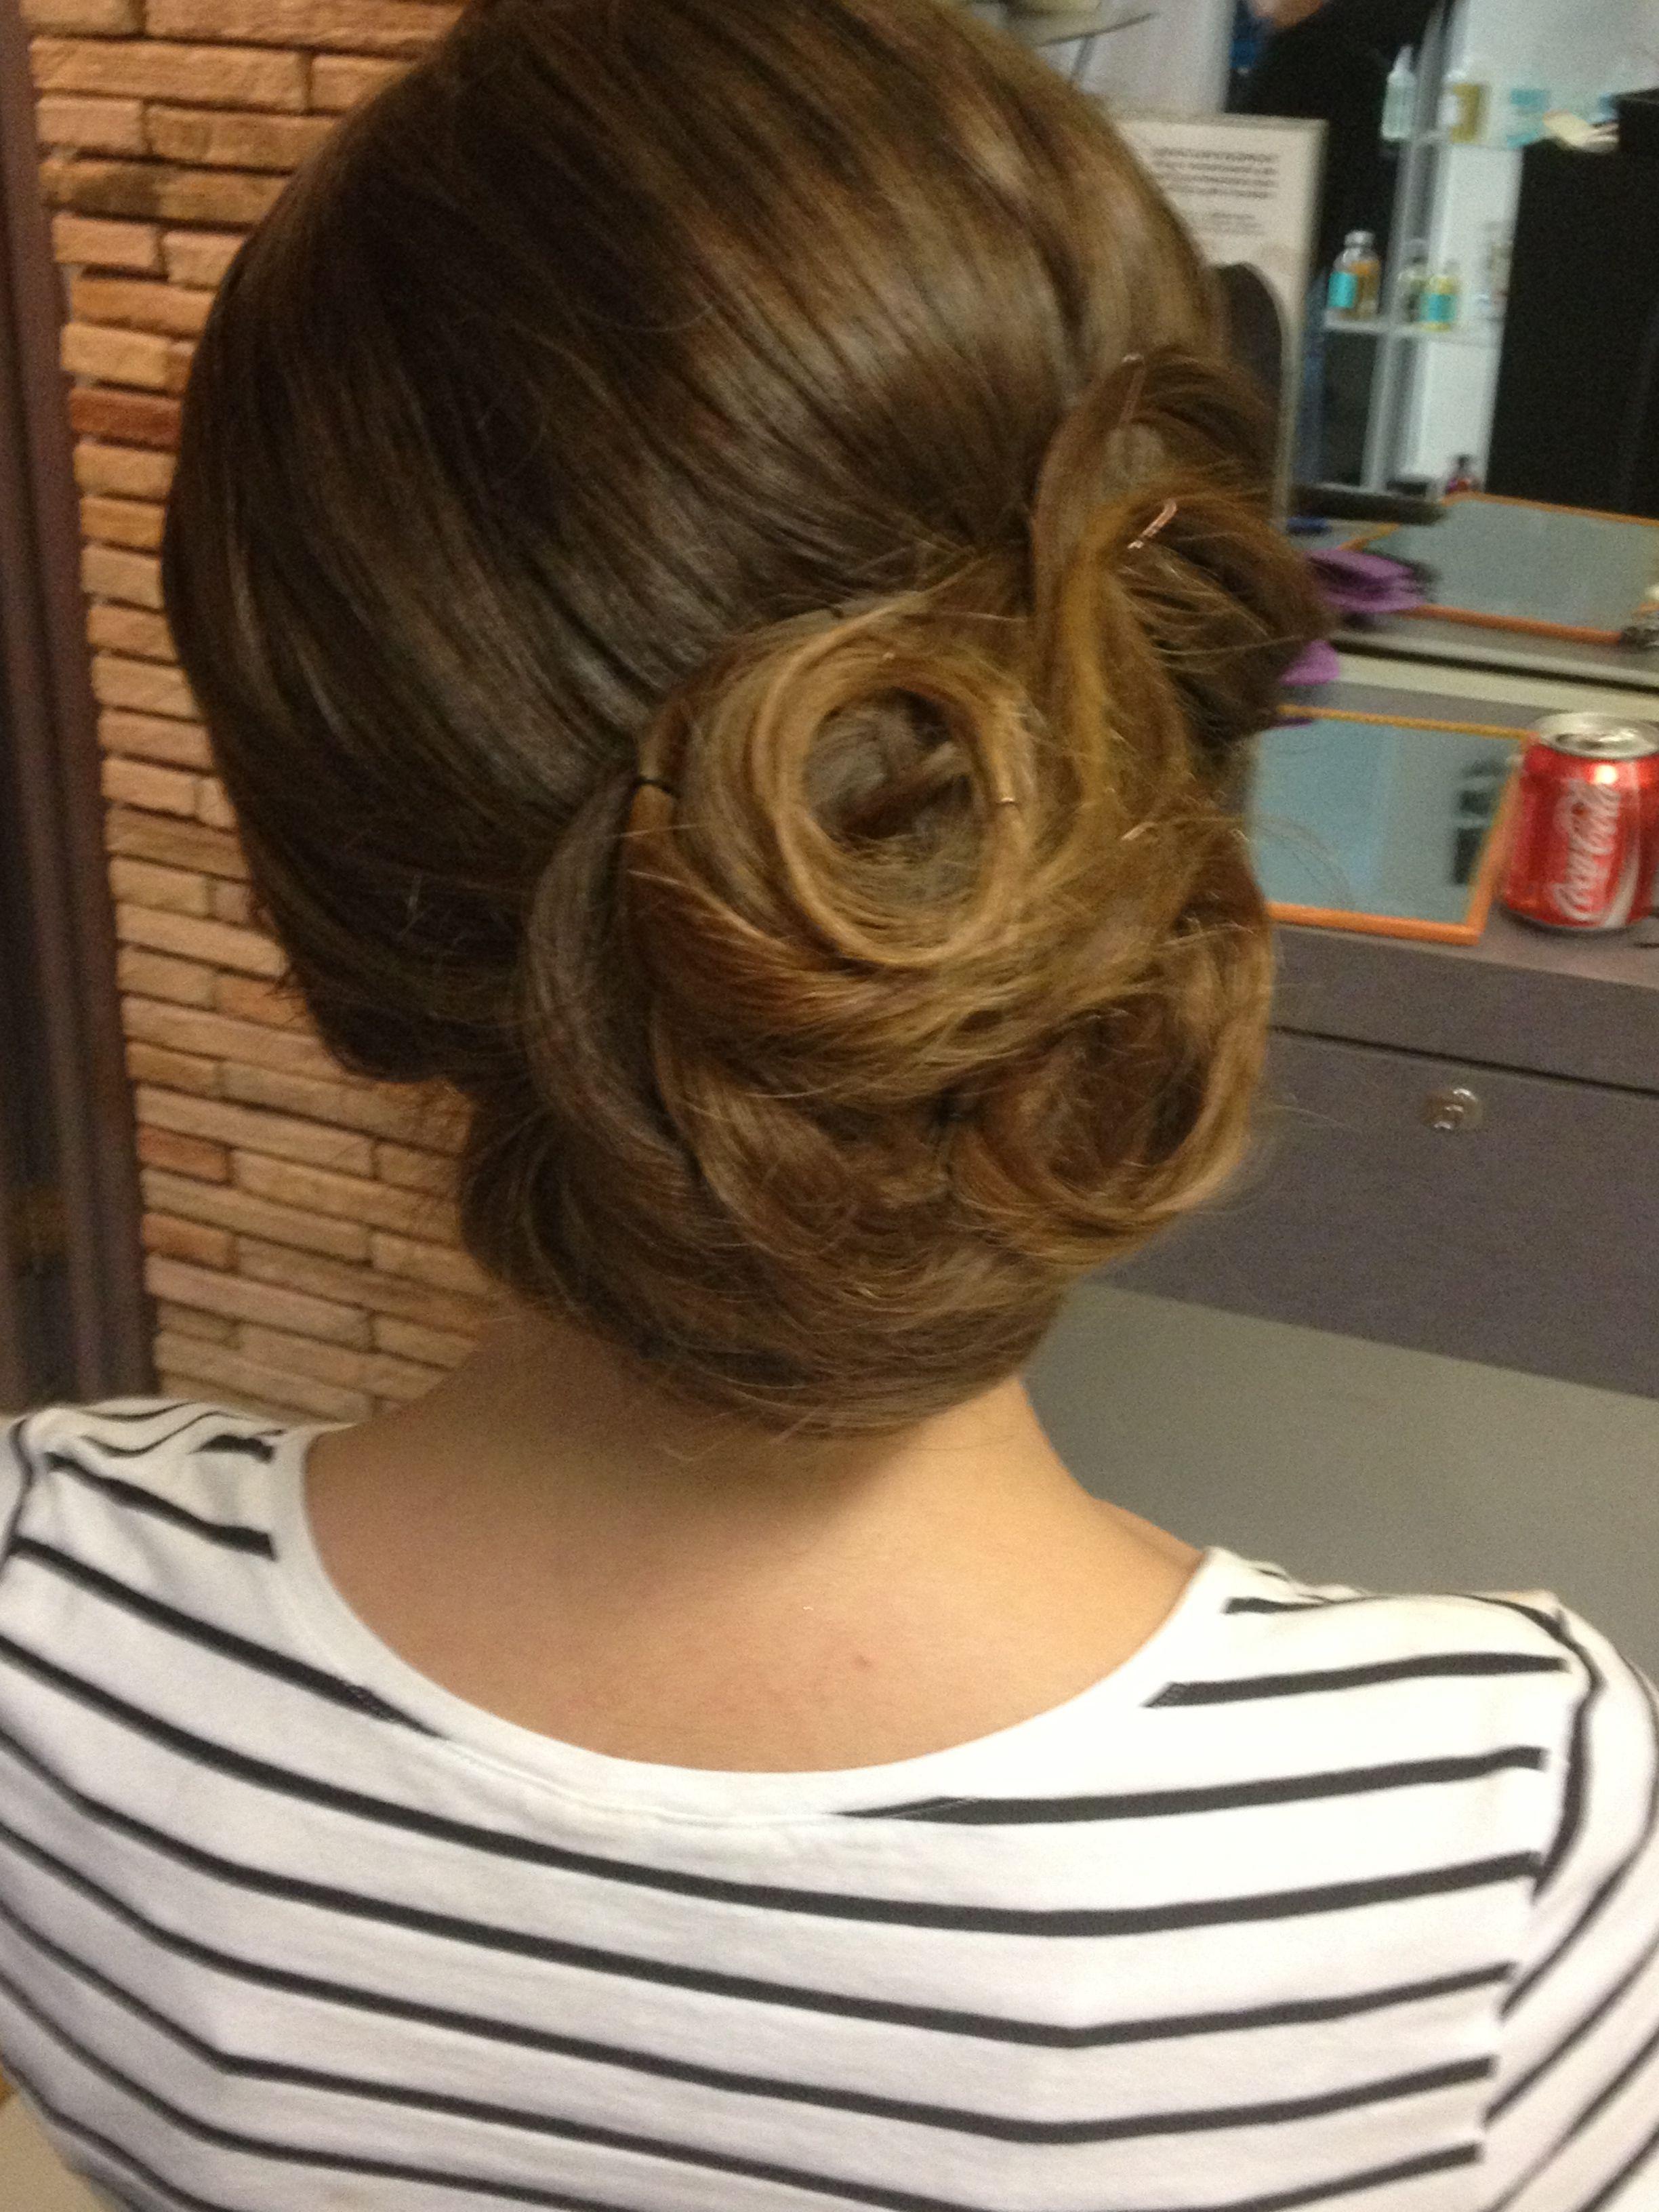 Long hair in a low bun elegant u cute for prom or wedding hair